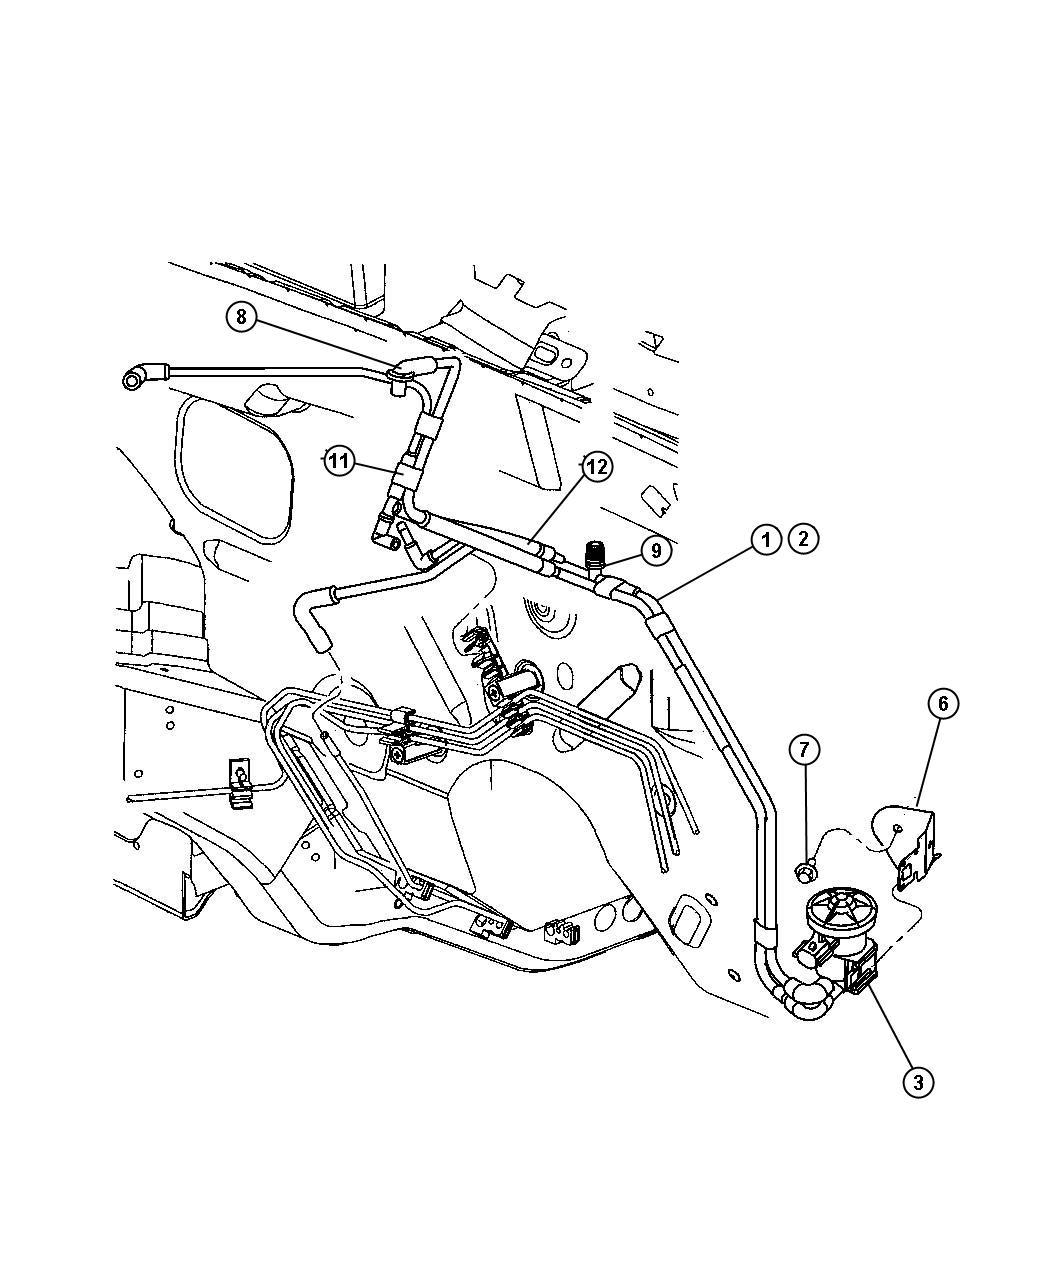 Chrysler Pt Cruiser Harness Vacuum Canister Purge